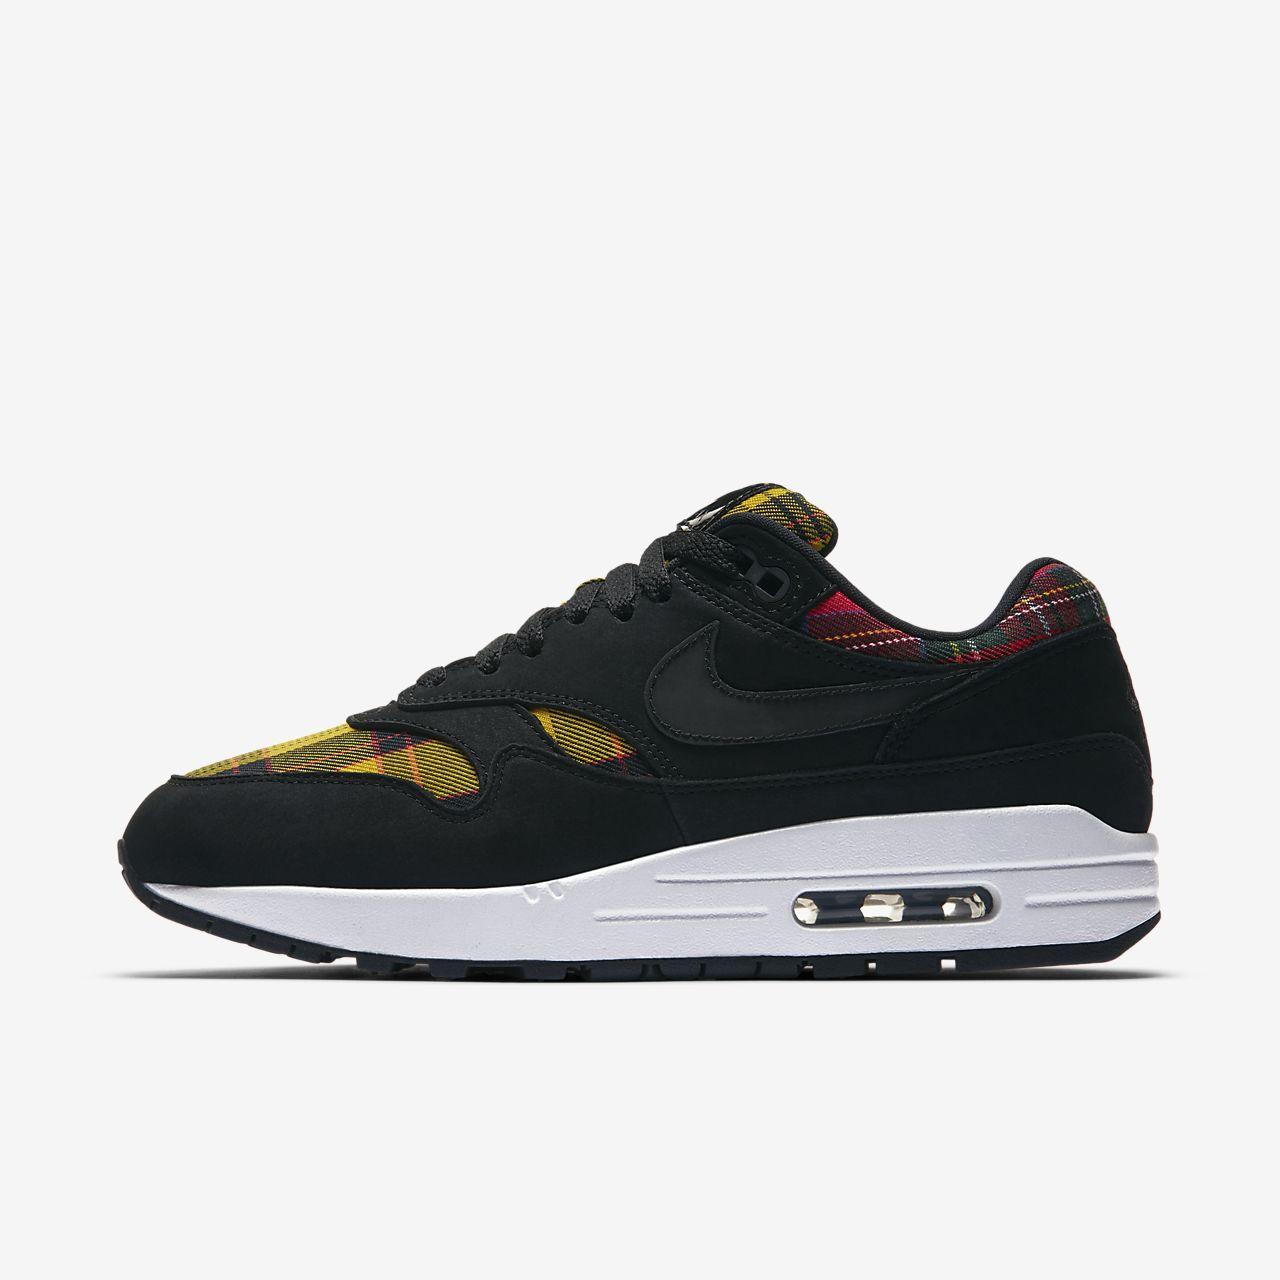 brand new 57a84 17718 ... promo code for nike air max 1 se tartan sko til kvinder 4029e abd91